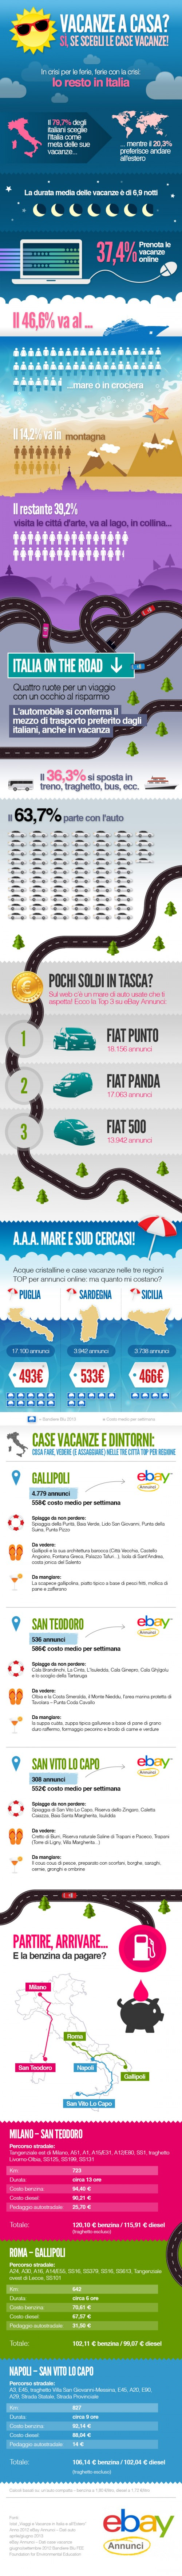 Infografica case vacanze eBay Annunci